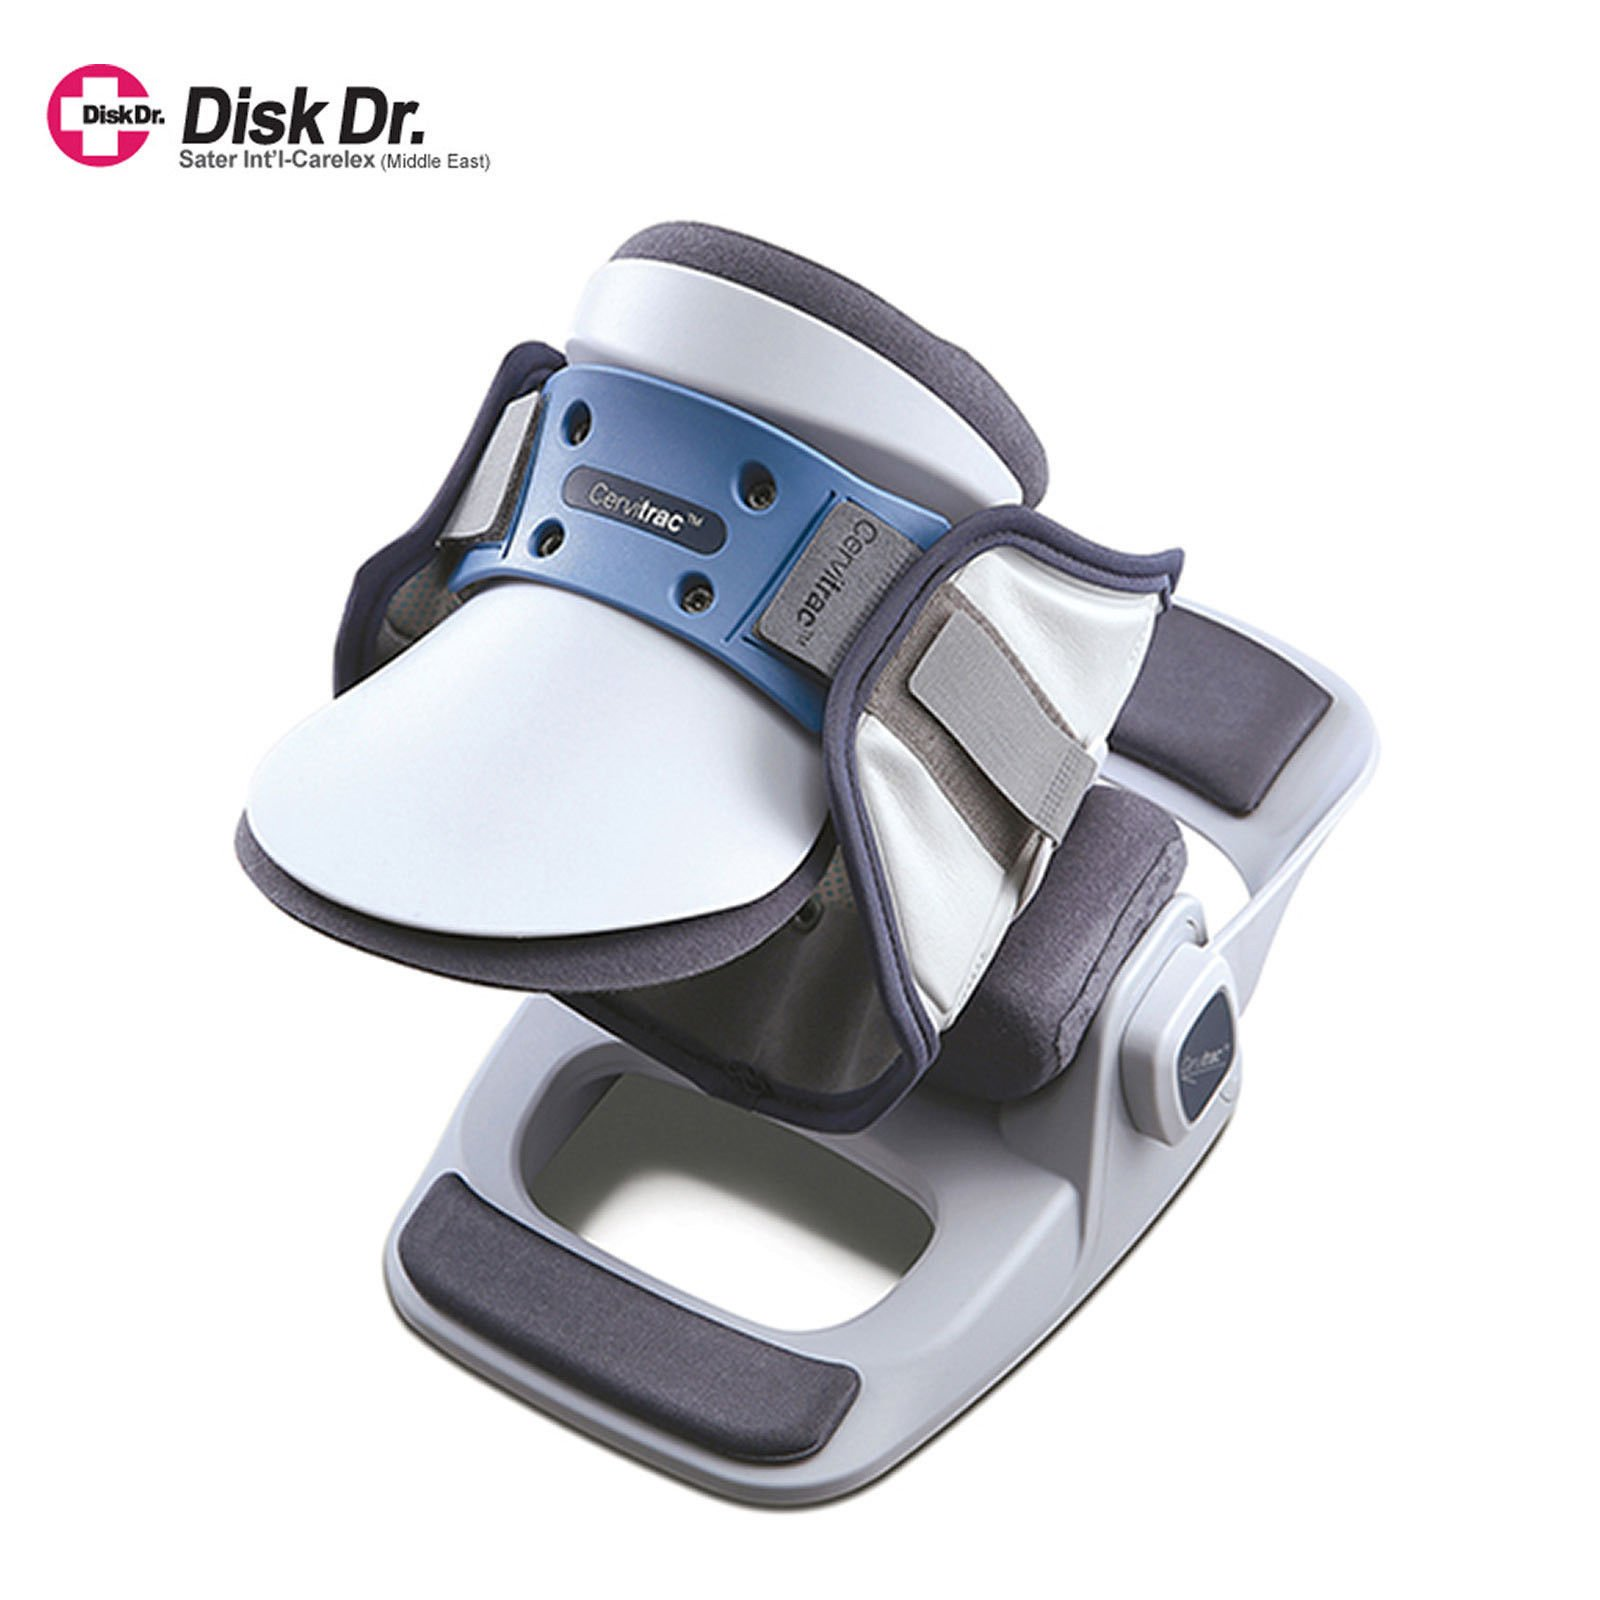 Disk Dr. CS500 Subtrack Neck Pain Relief cervical traction device